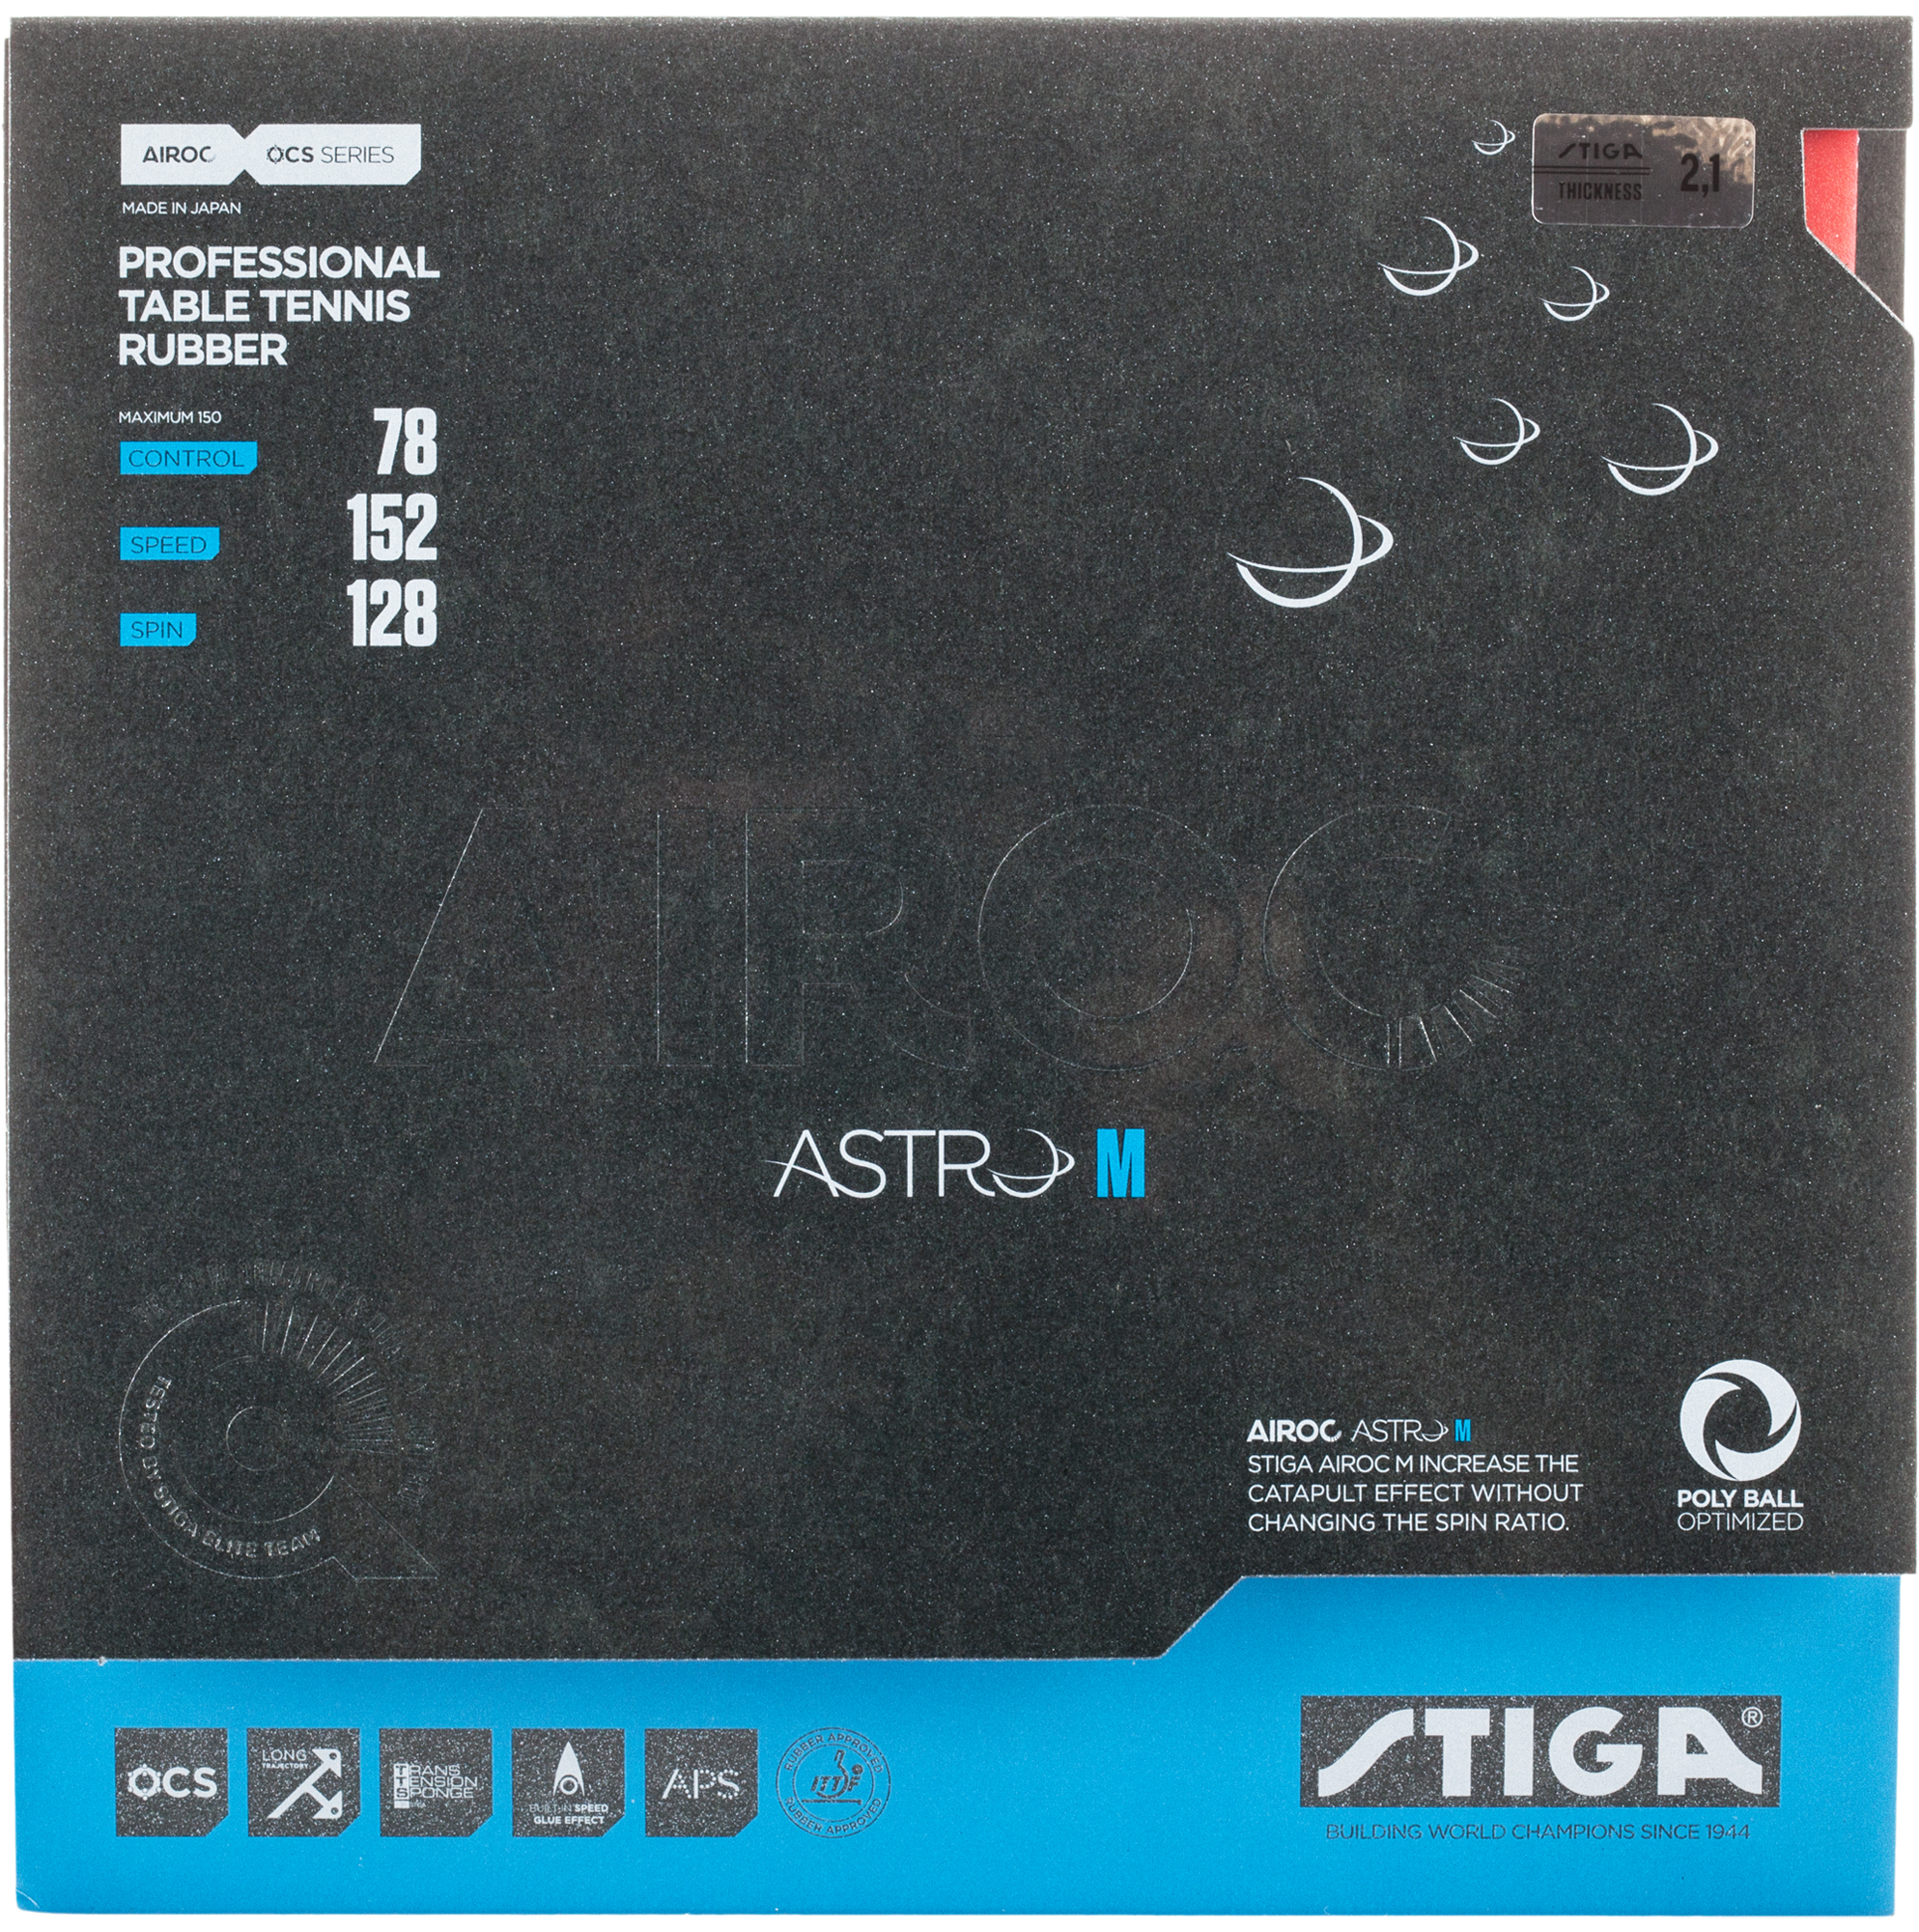 Stiga Накладка Stiga Airoc Astro M 2,1 мм, размер Без размера stiga накладка stiga jms evo 1